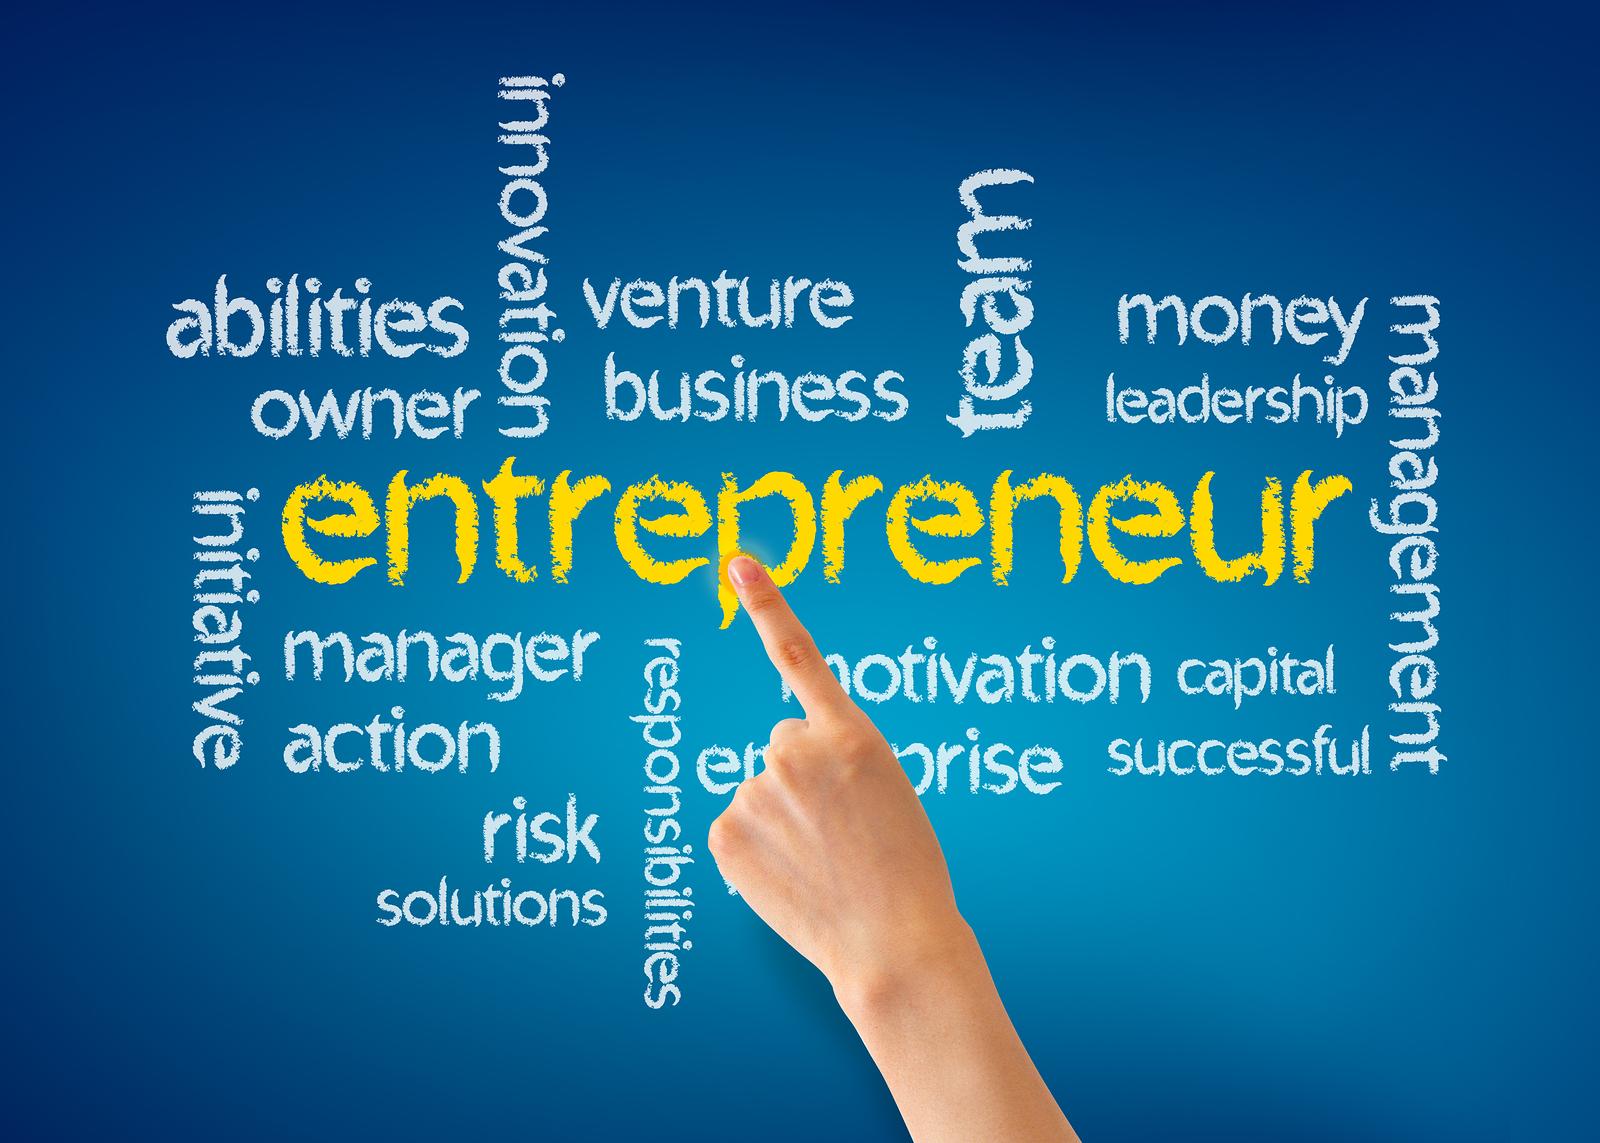 bigstock-Entrepreneur-33317474